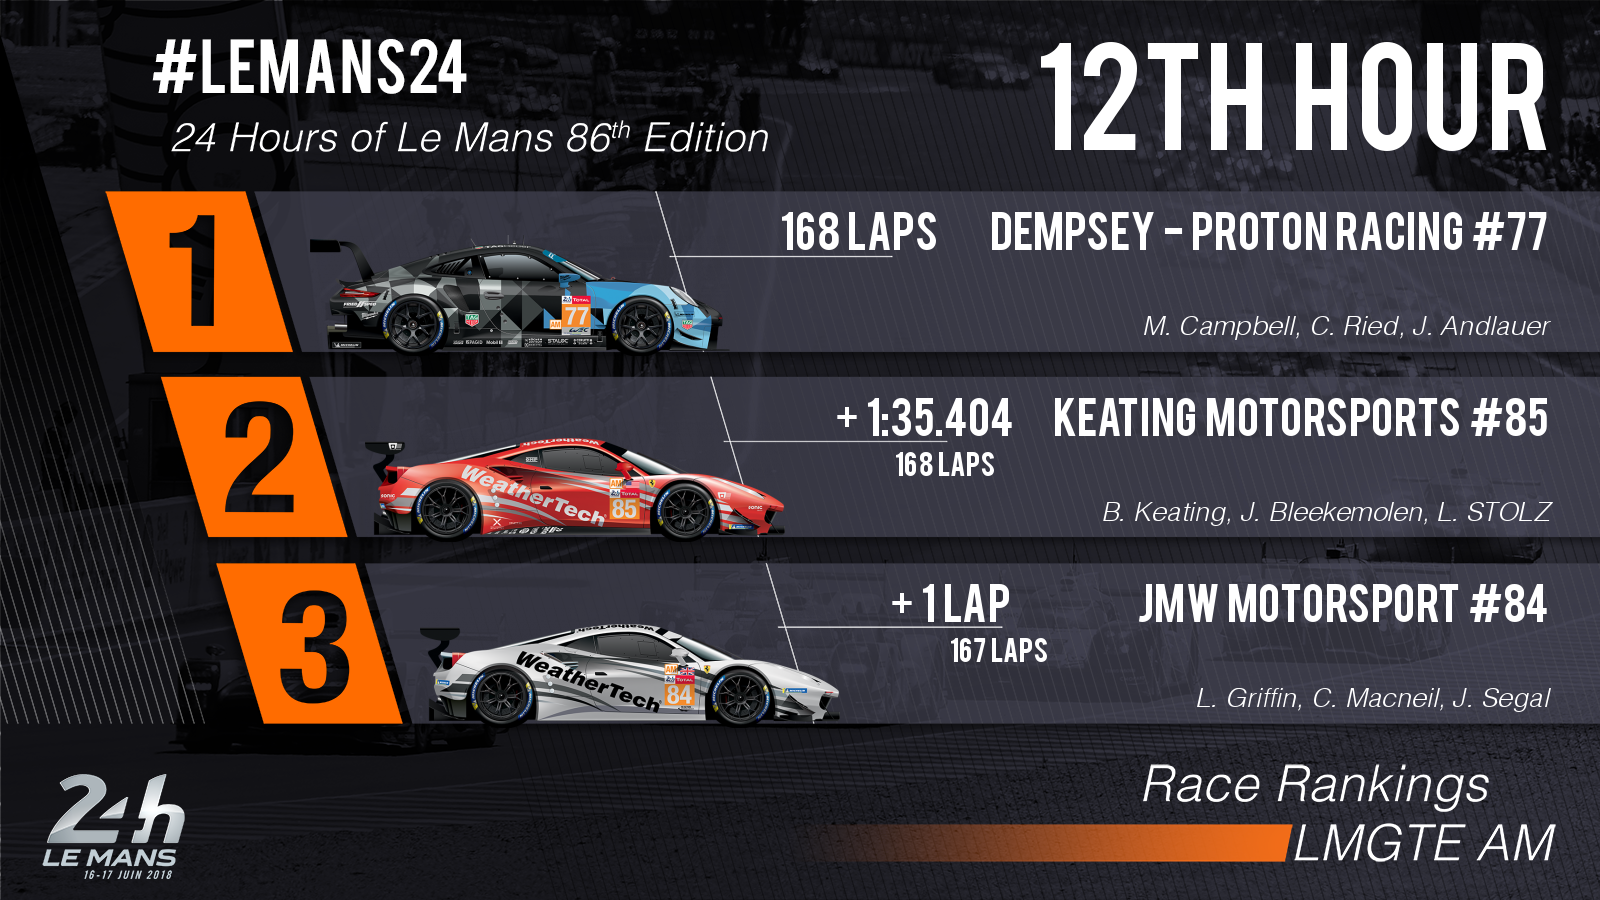 24 Horas de Le Mans 2018 - Página 3 5b25b2d6705d3